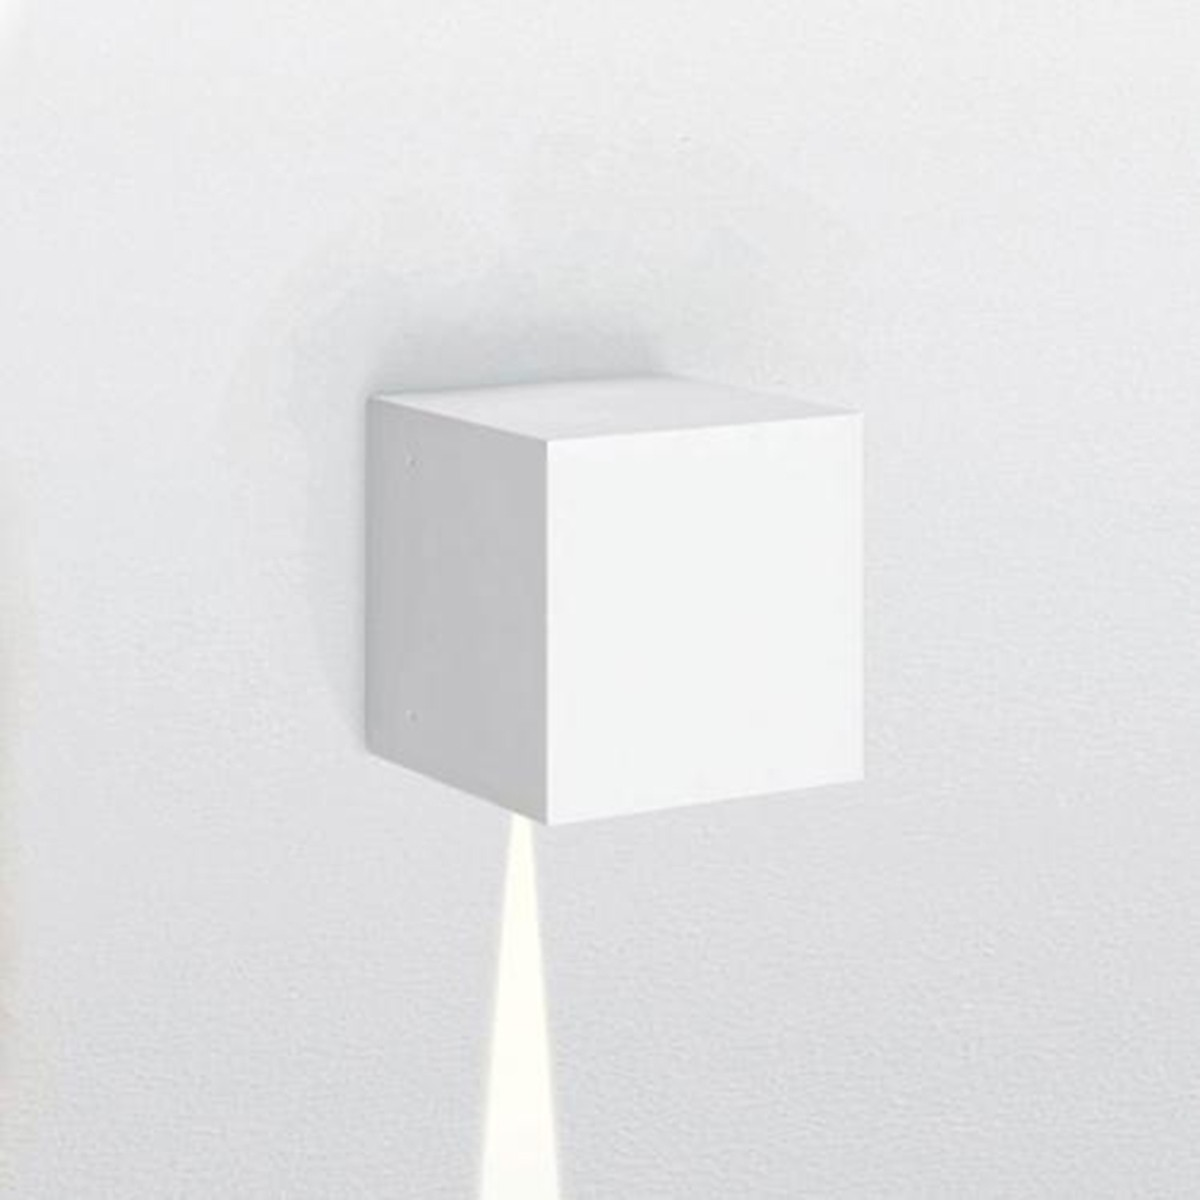 Artemide Outdoor Effetto 14S LED 1N Wandleuchte, 1 x 5°, 3000 K, hellgrau